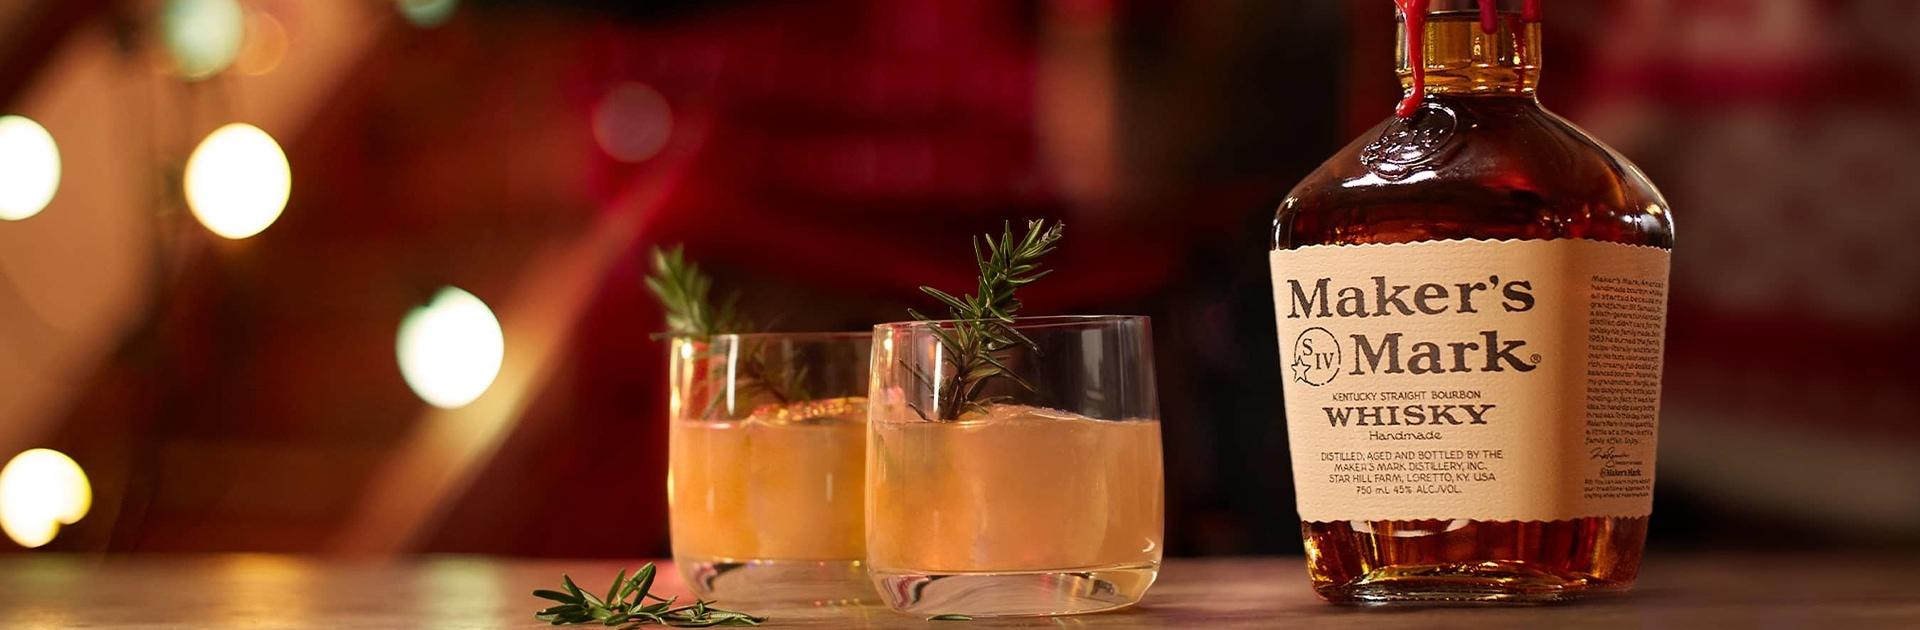 Maker's Mark Bourbon Whisky Delivered to you in Nairobi